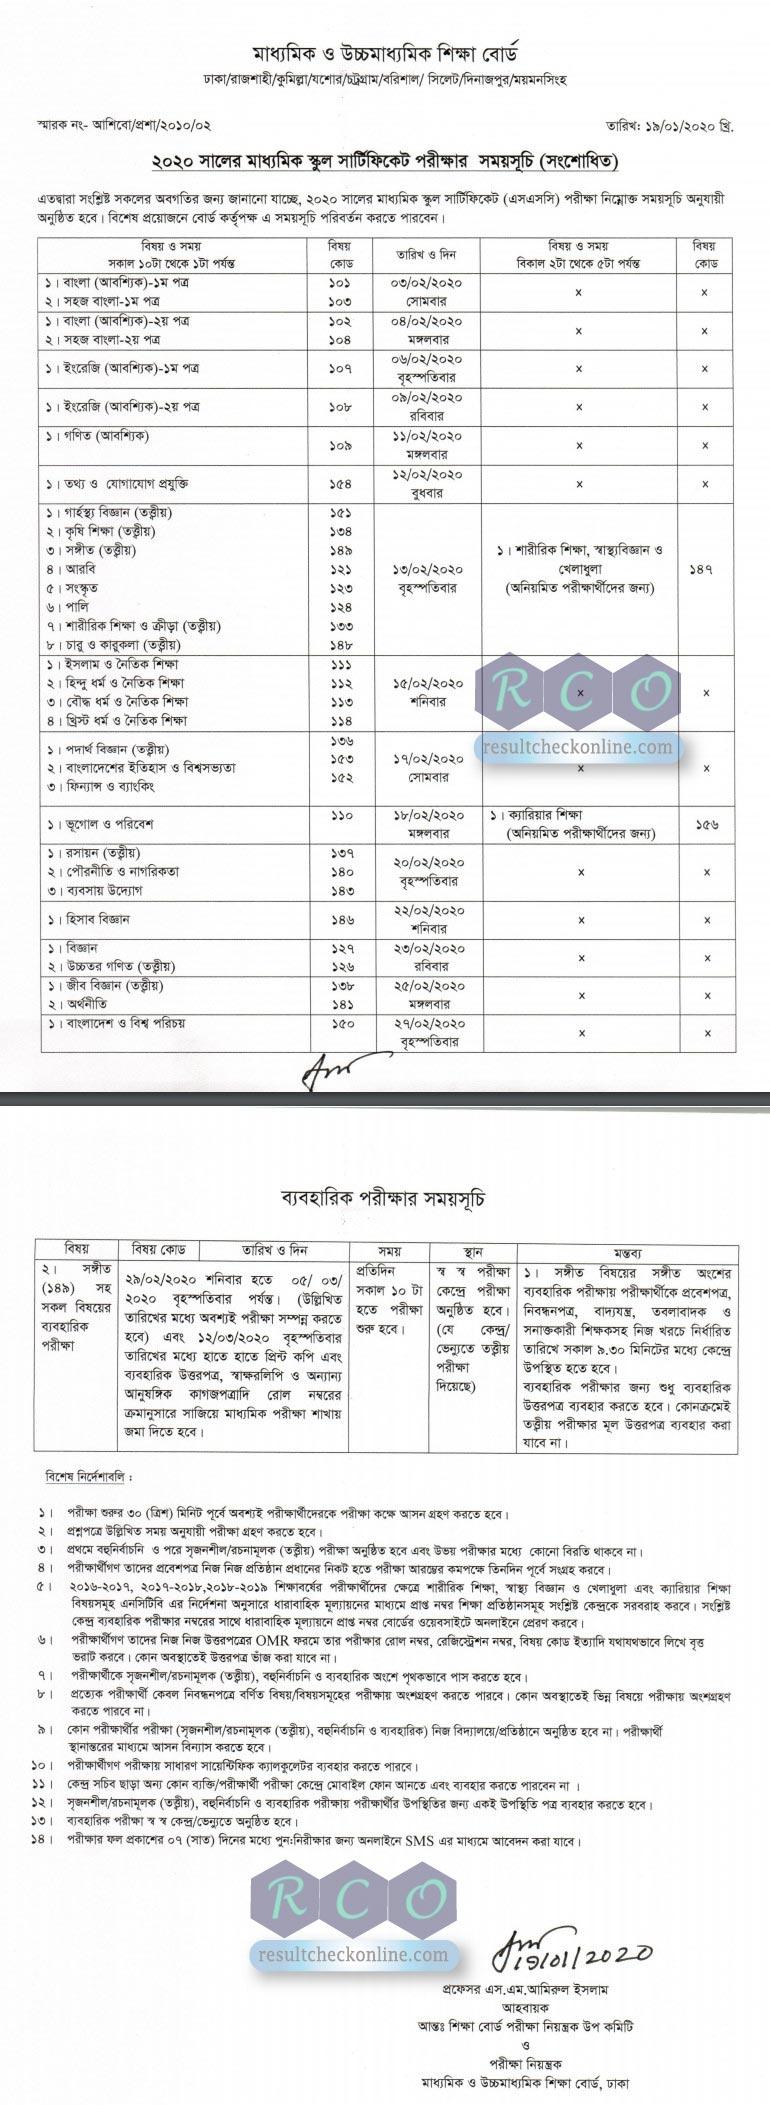 SSC Exam Routine 2020, SSC new routine 2020